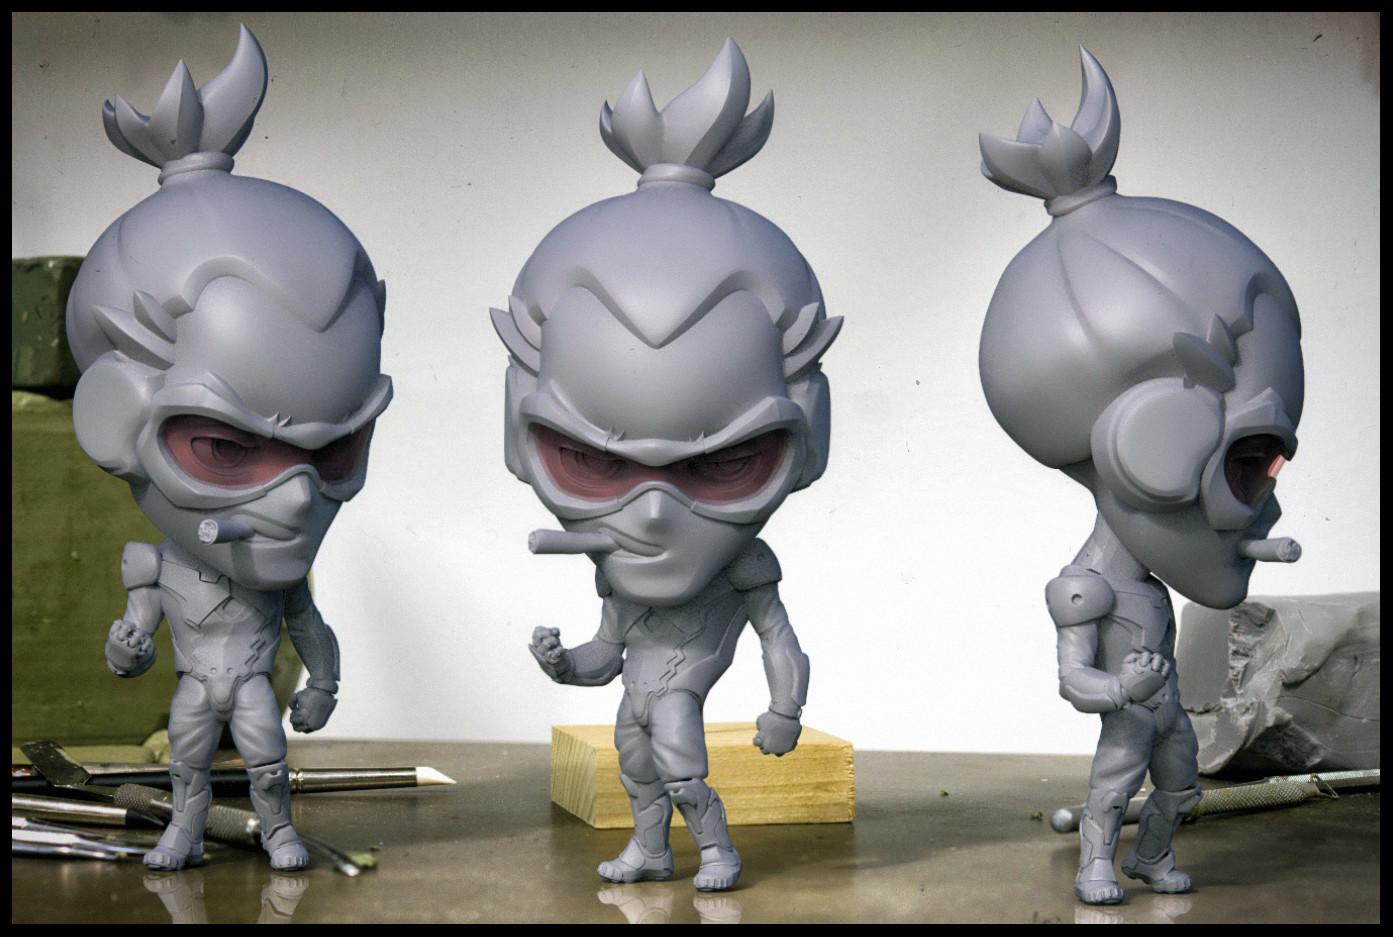 Custom Nendoroid Figures (personal work)